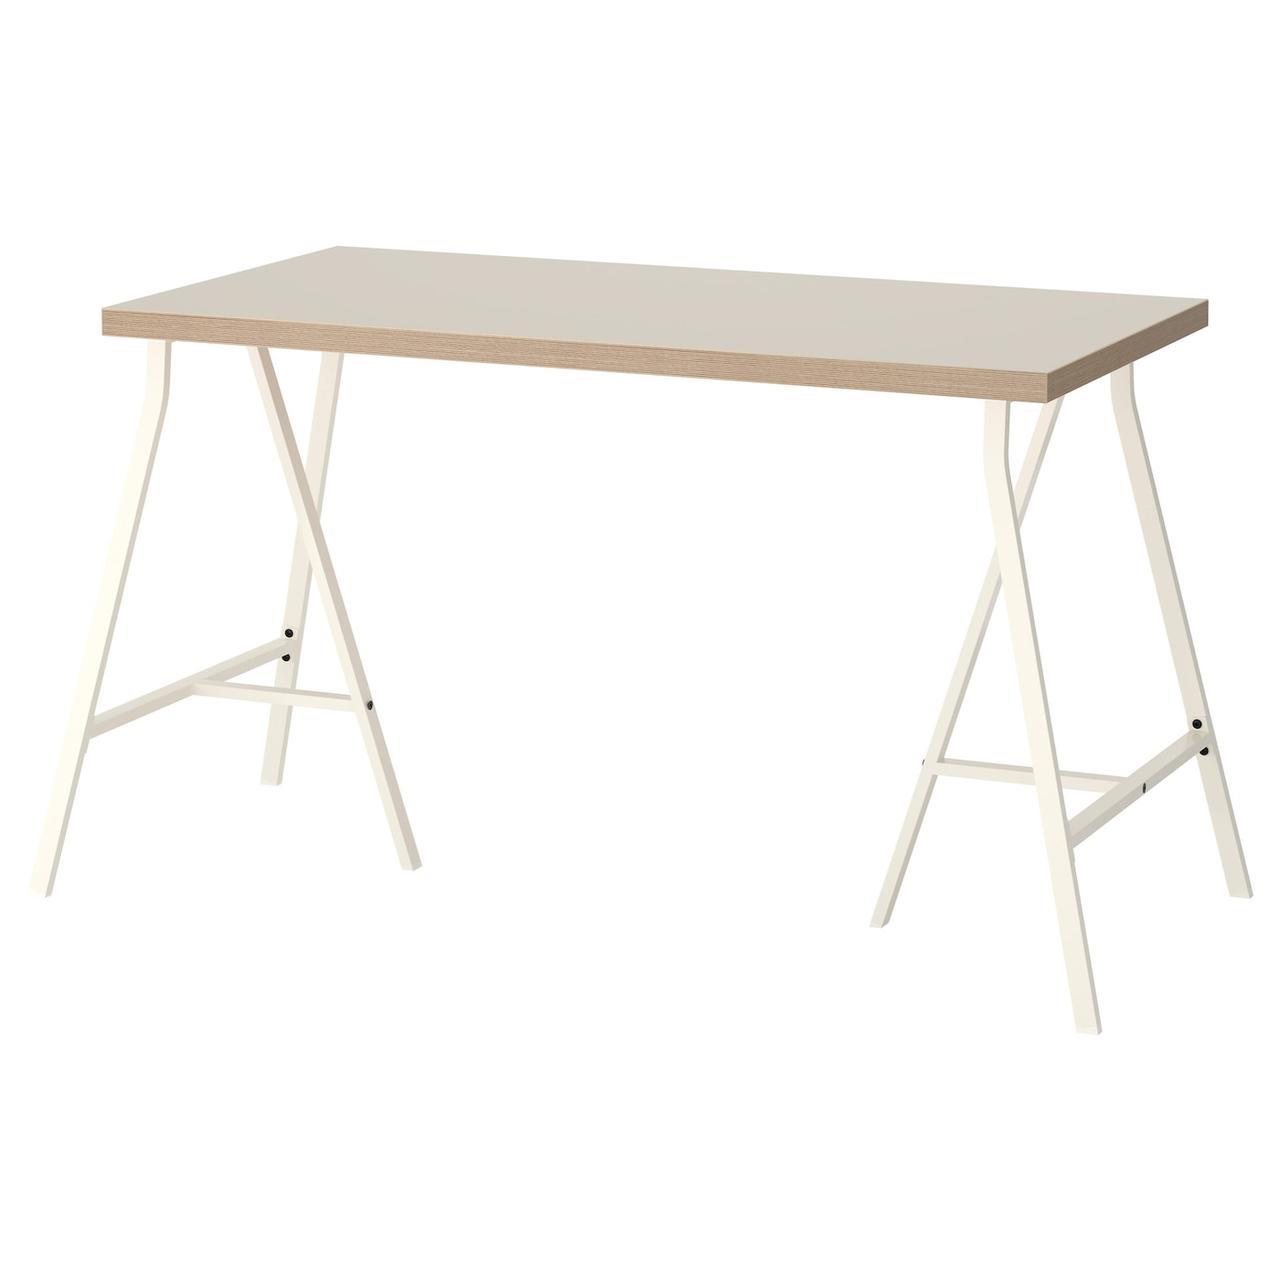 Компьютерный стол IKEA LINNMON / LERBERG бежевый, белый 120x60 см 992.142.76